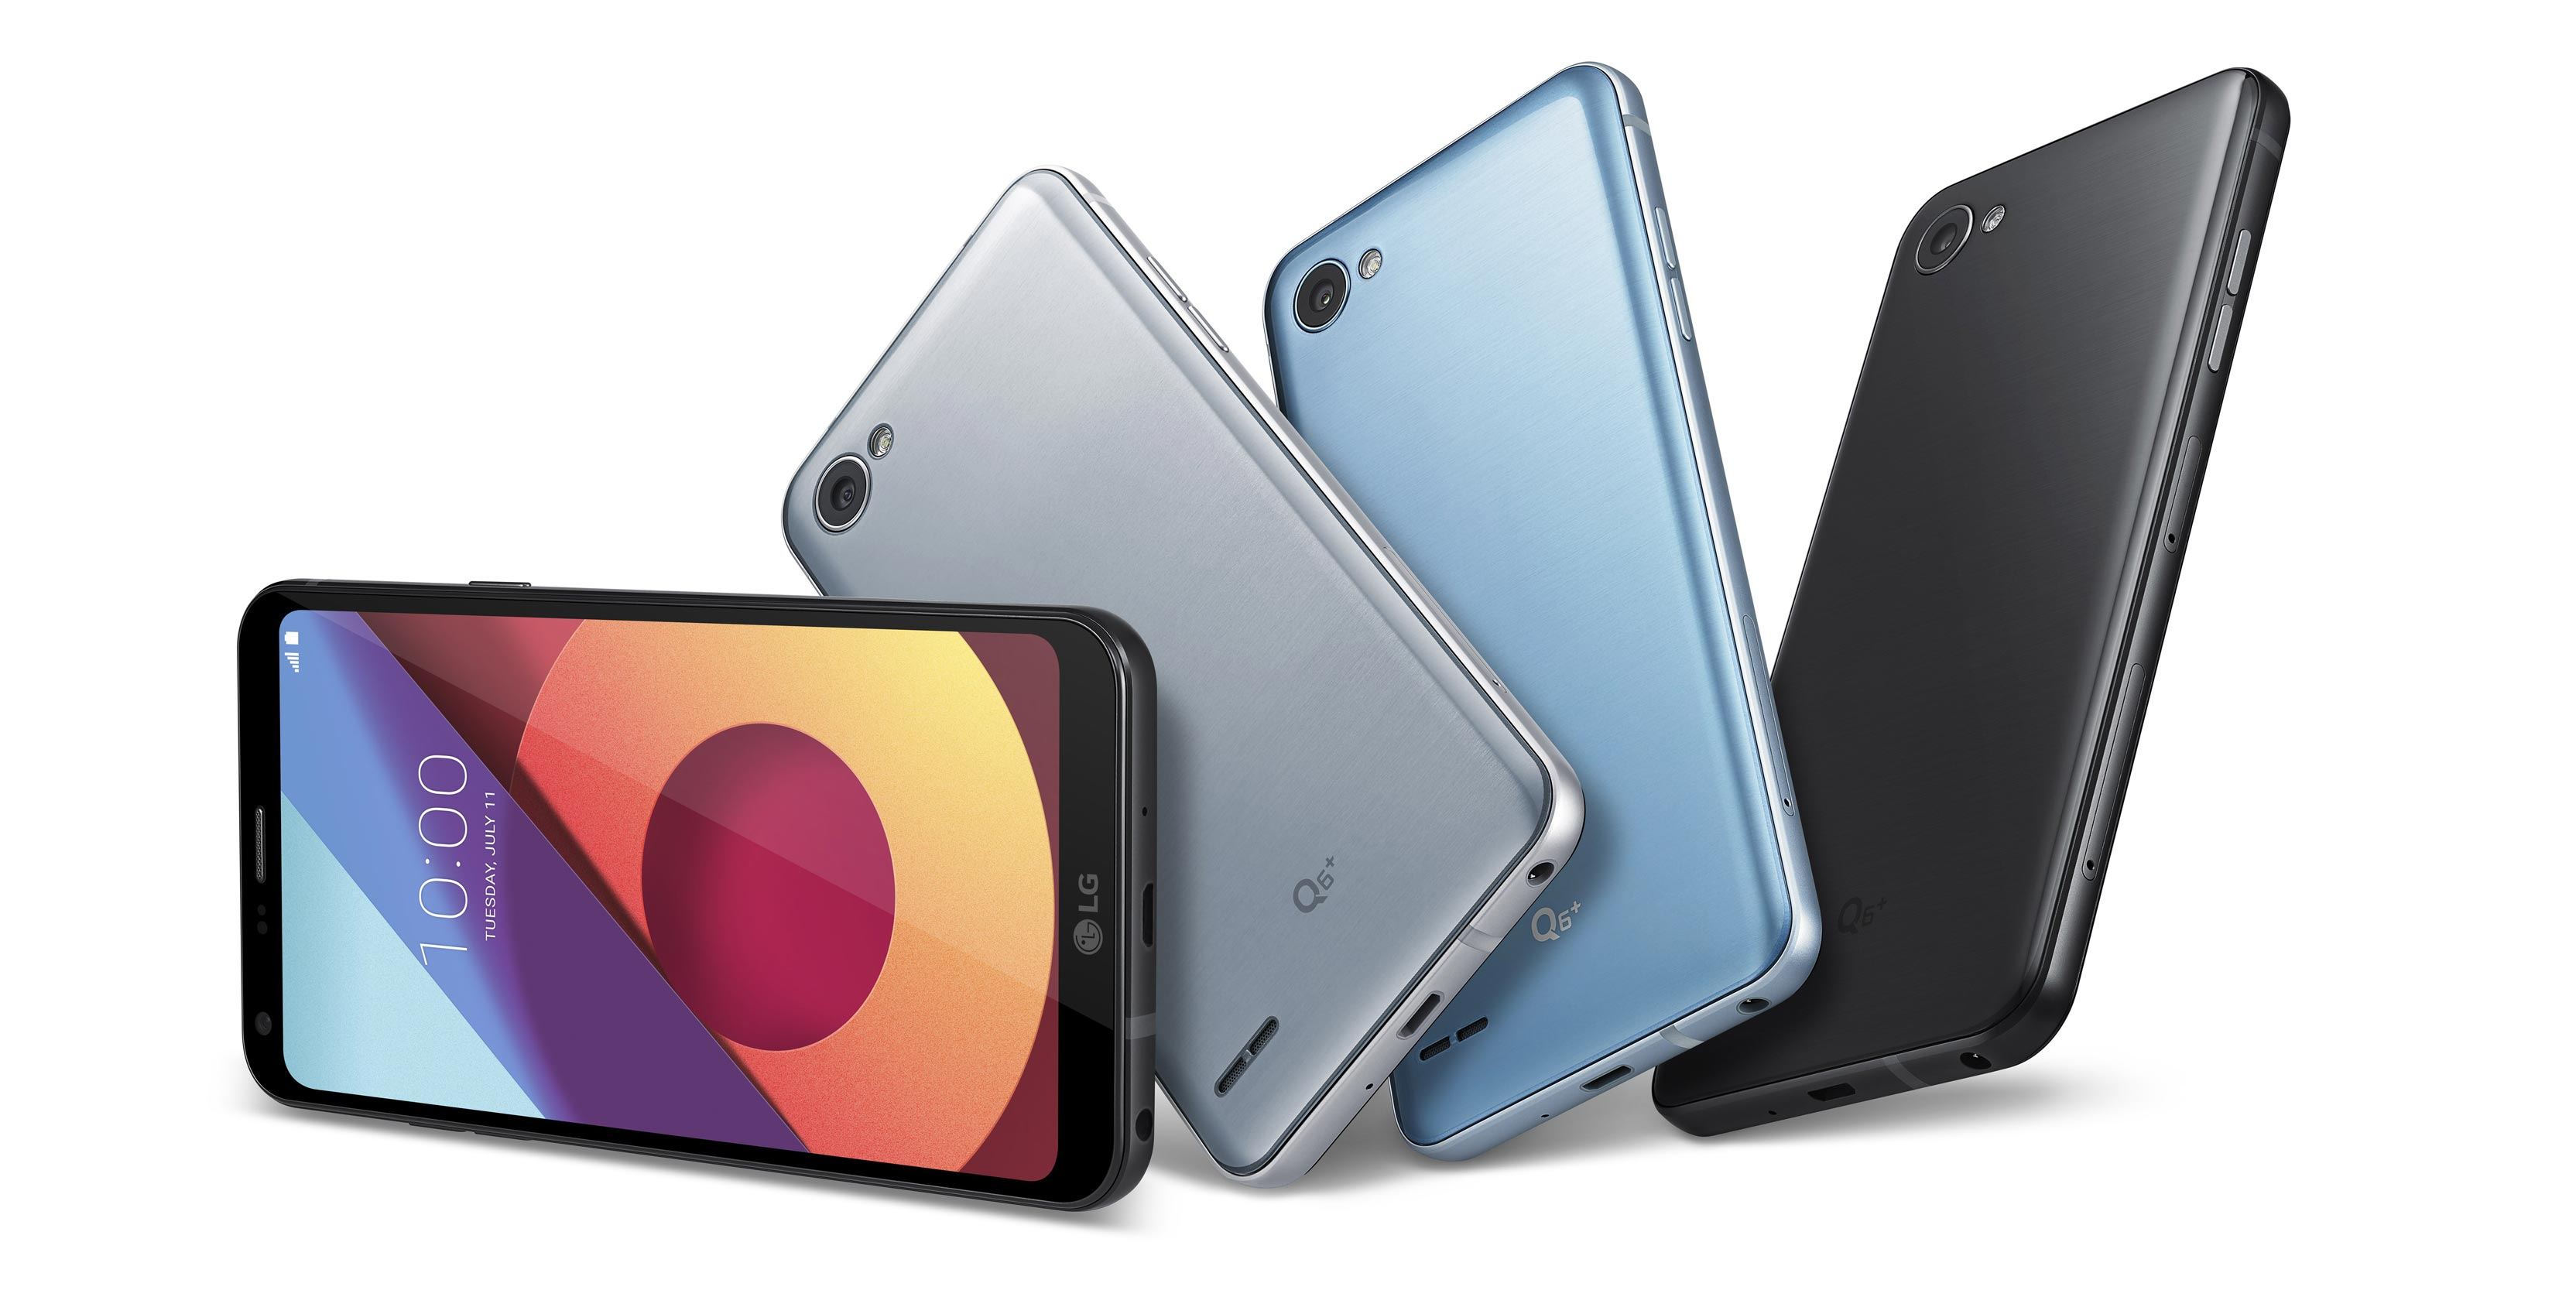 LG Q6 series smartphone